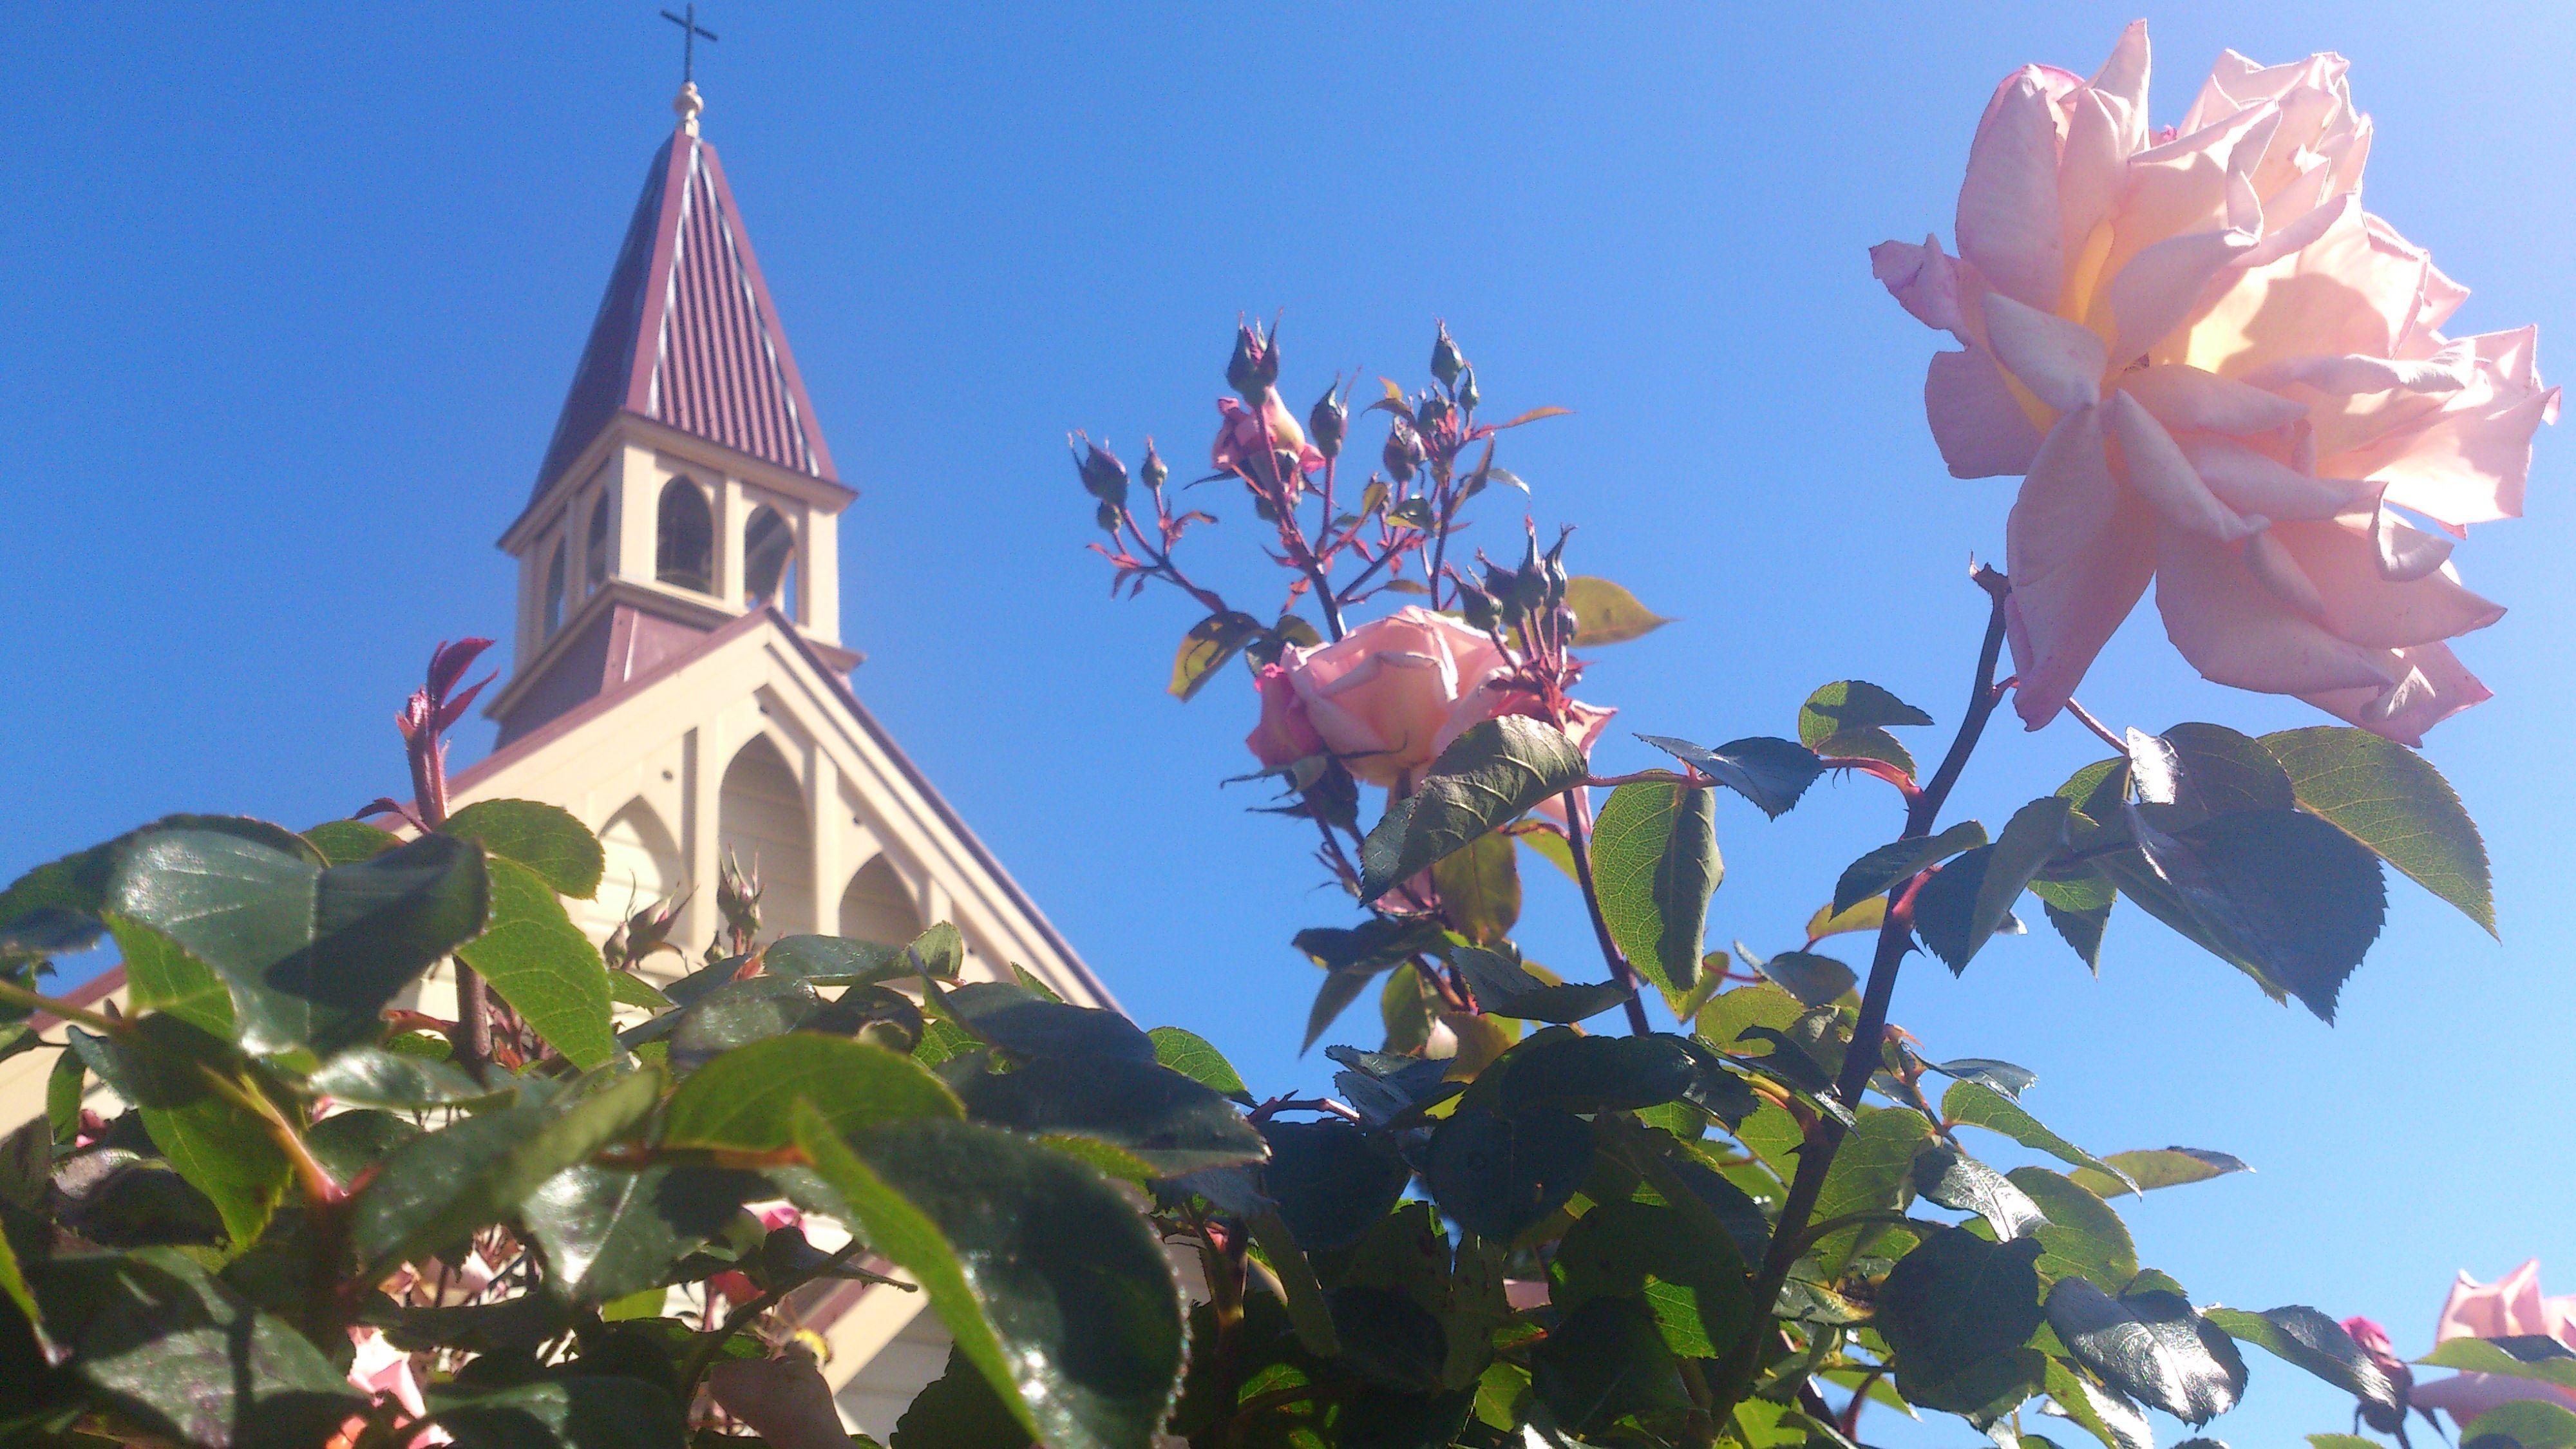 The Chapel of St Francis in #upperhutt #wellington #newzealand